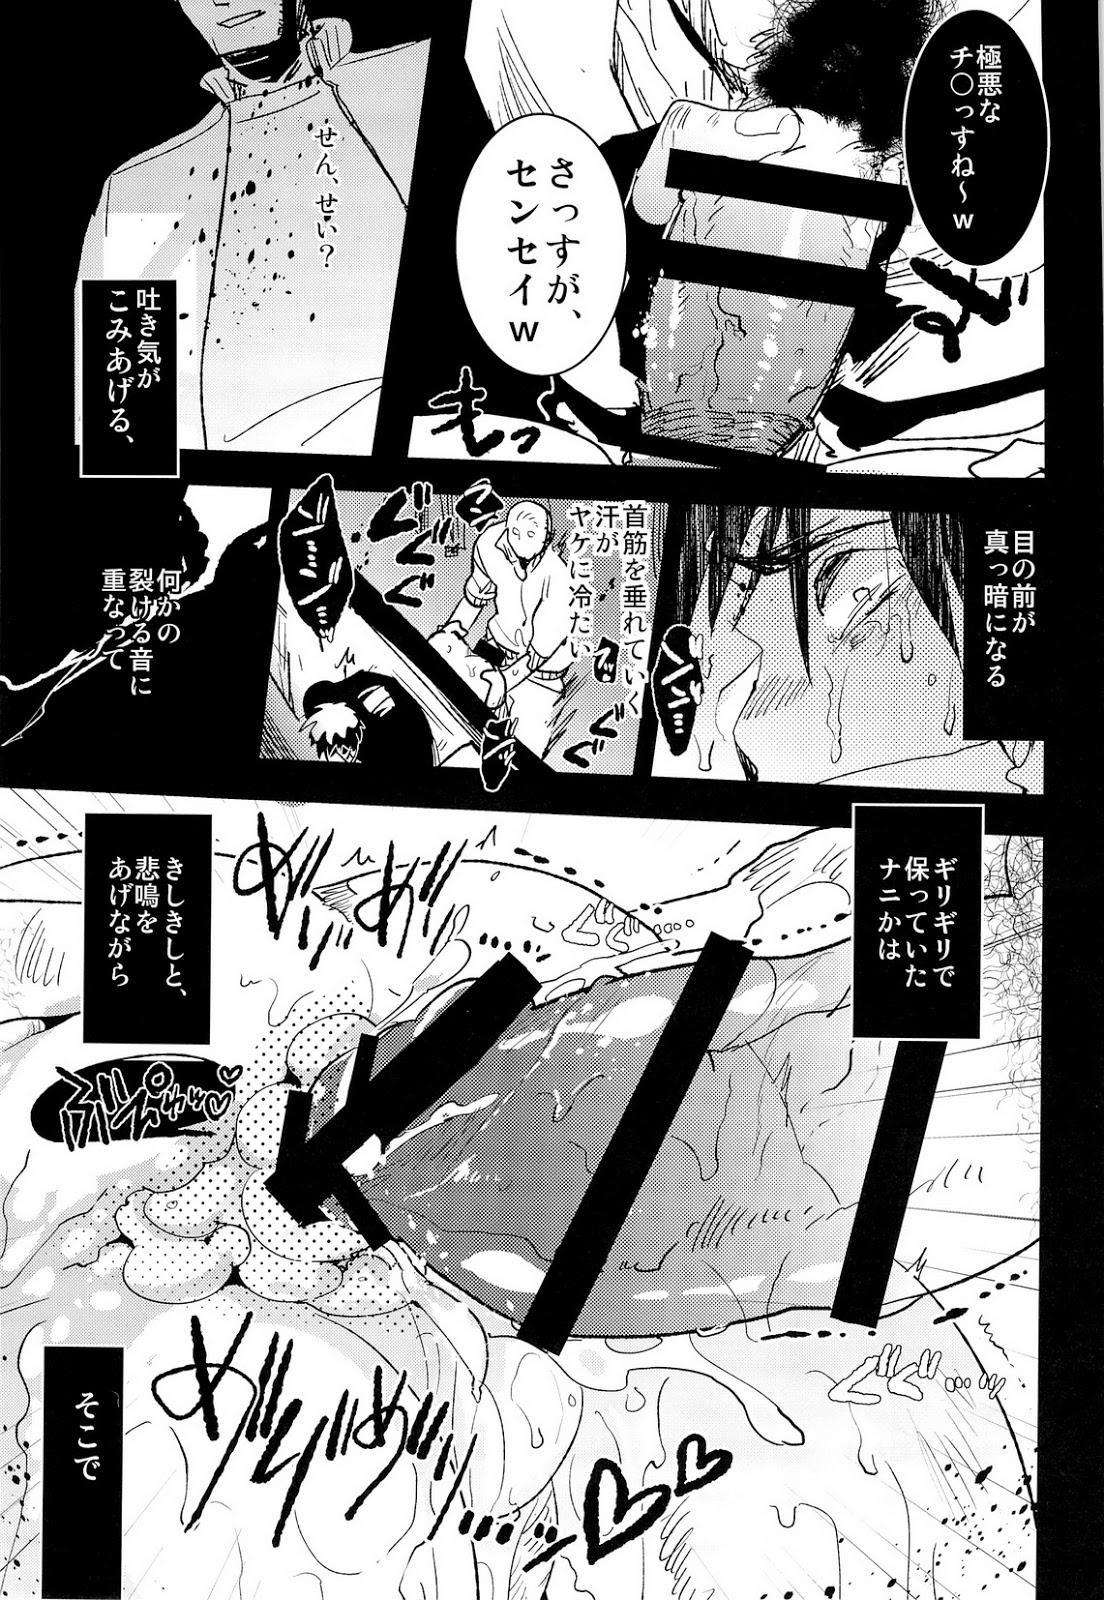 Kabejiri Hon - DK Fuck 22